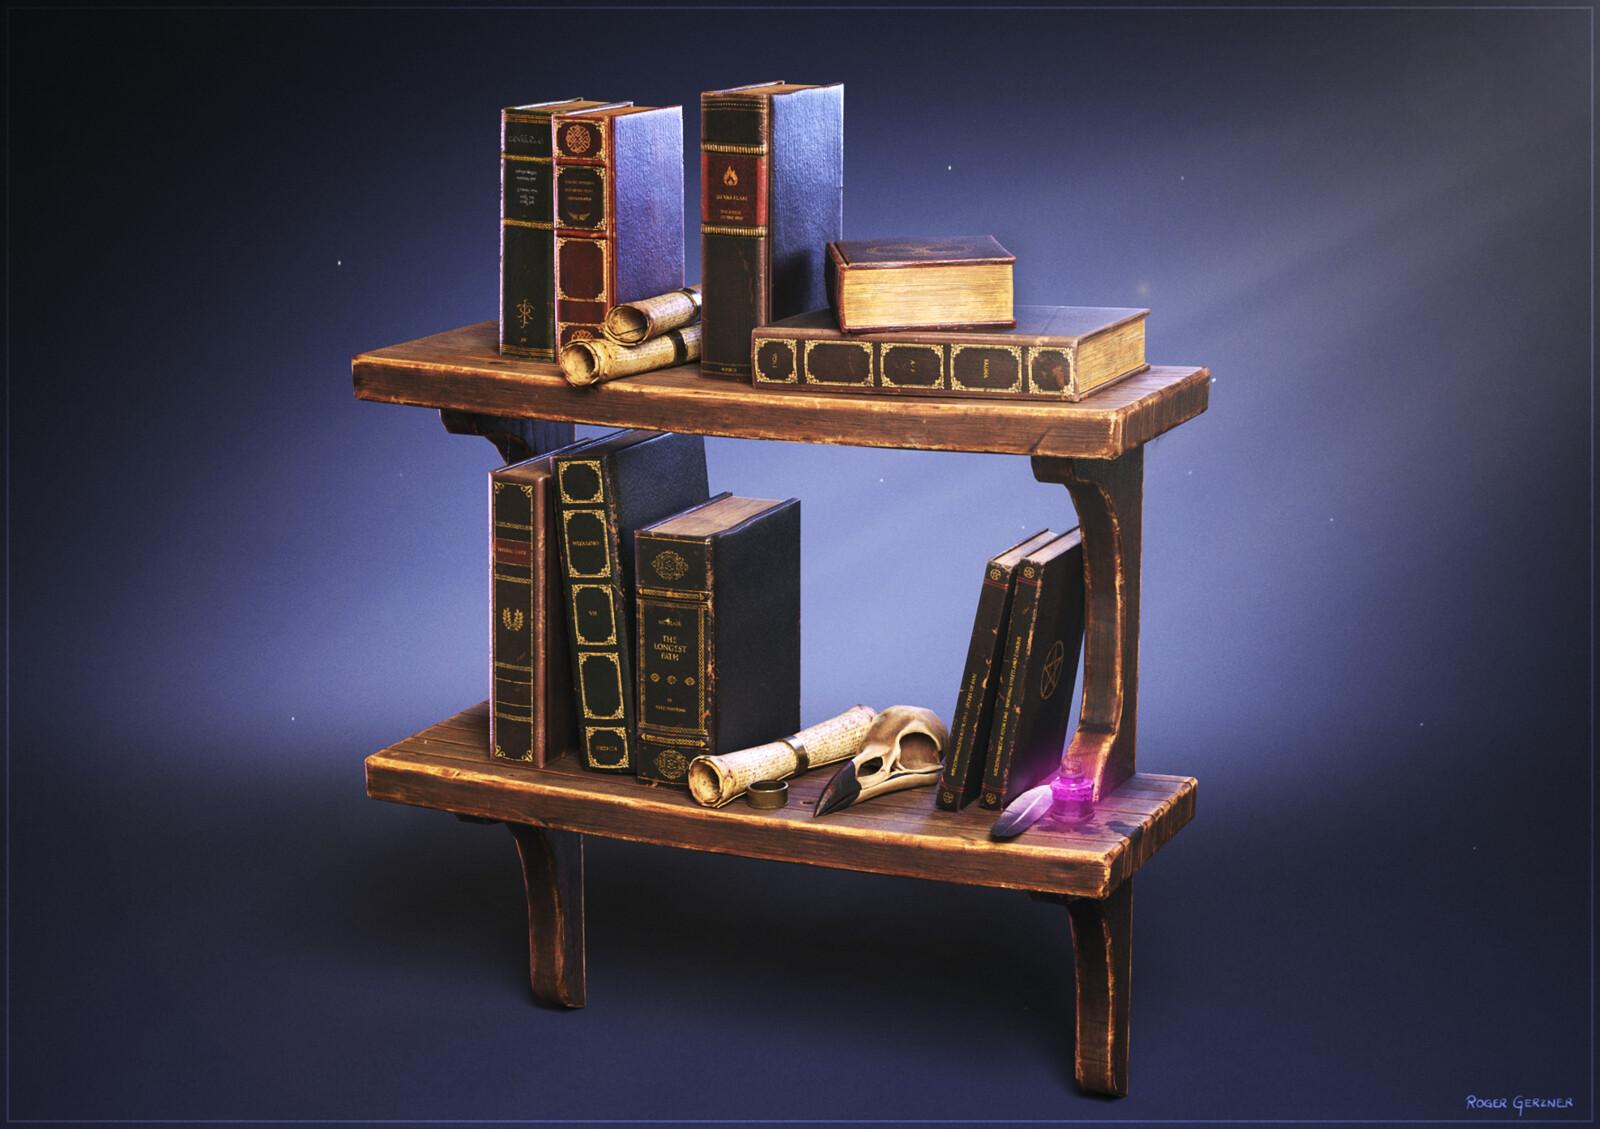 The Old Wizards Bookshelf